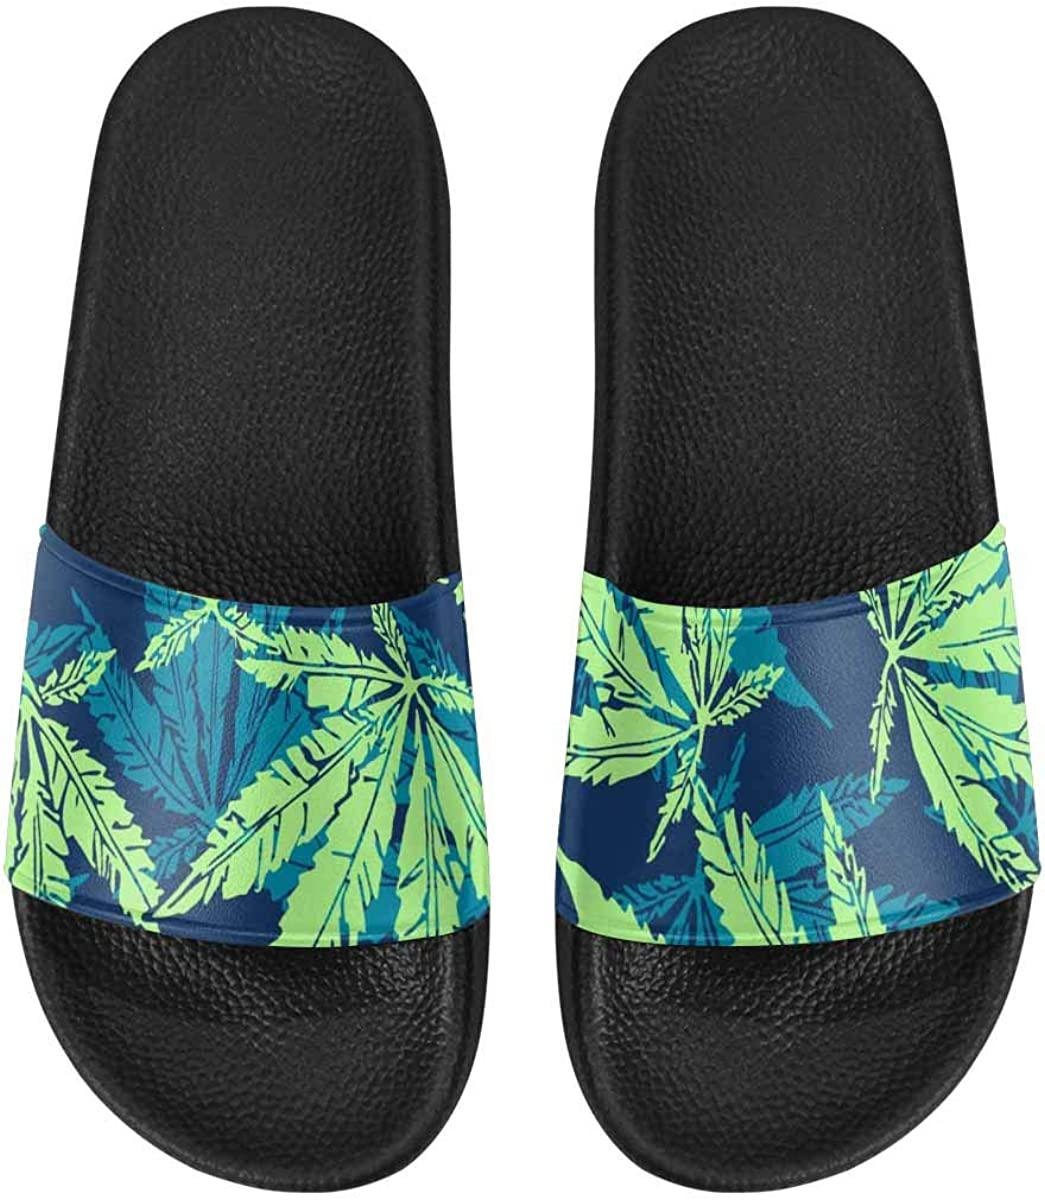 InterestPrint Women's Stylish Slipper Sandals for Summer Marijuana Tropical Pattern